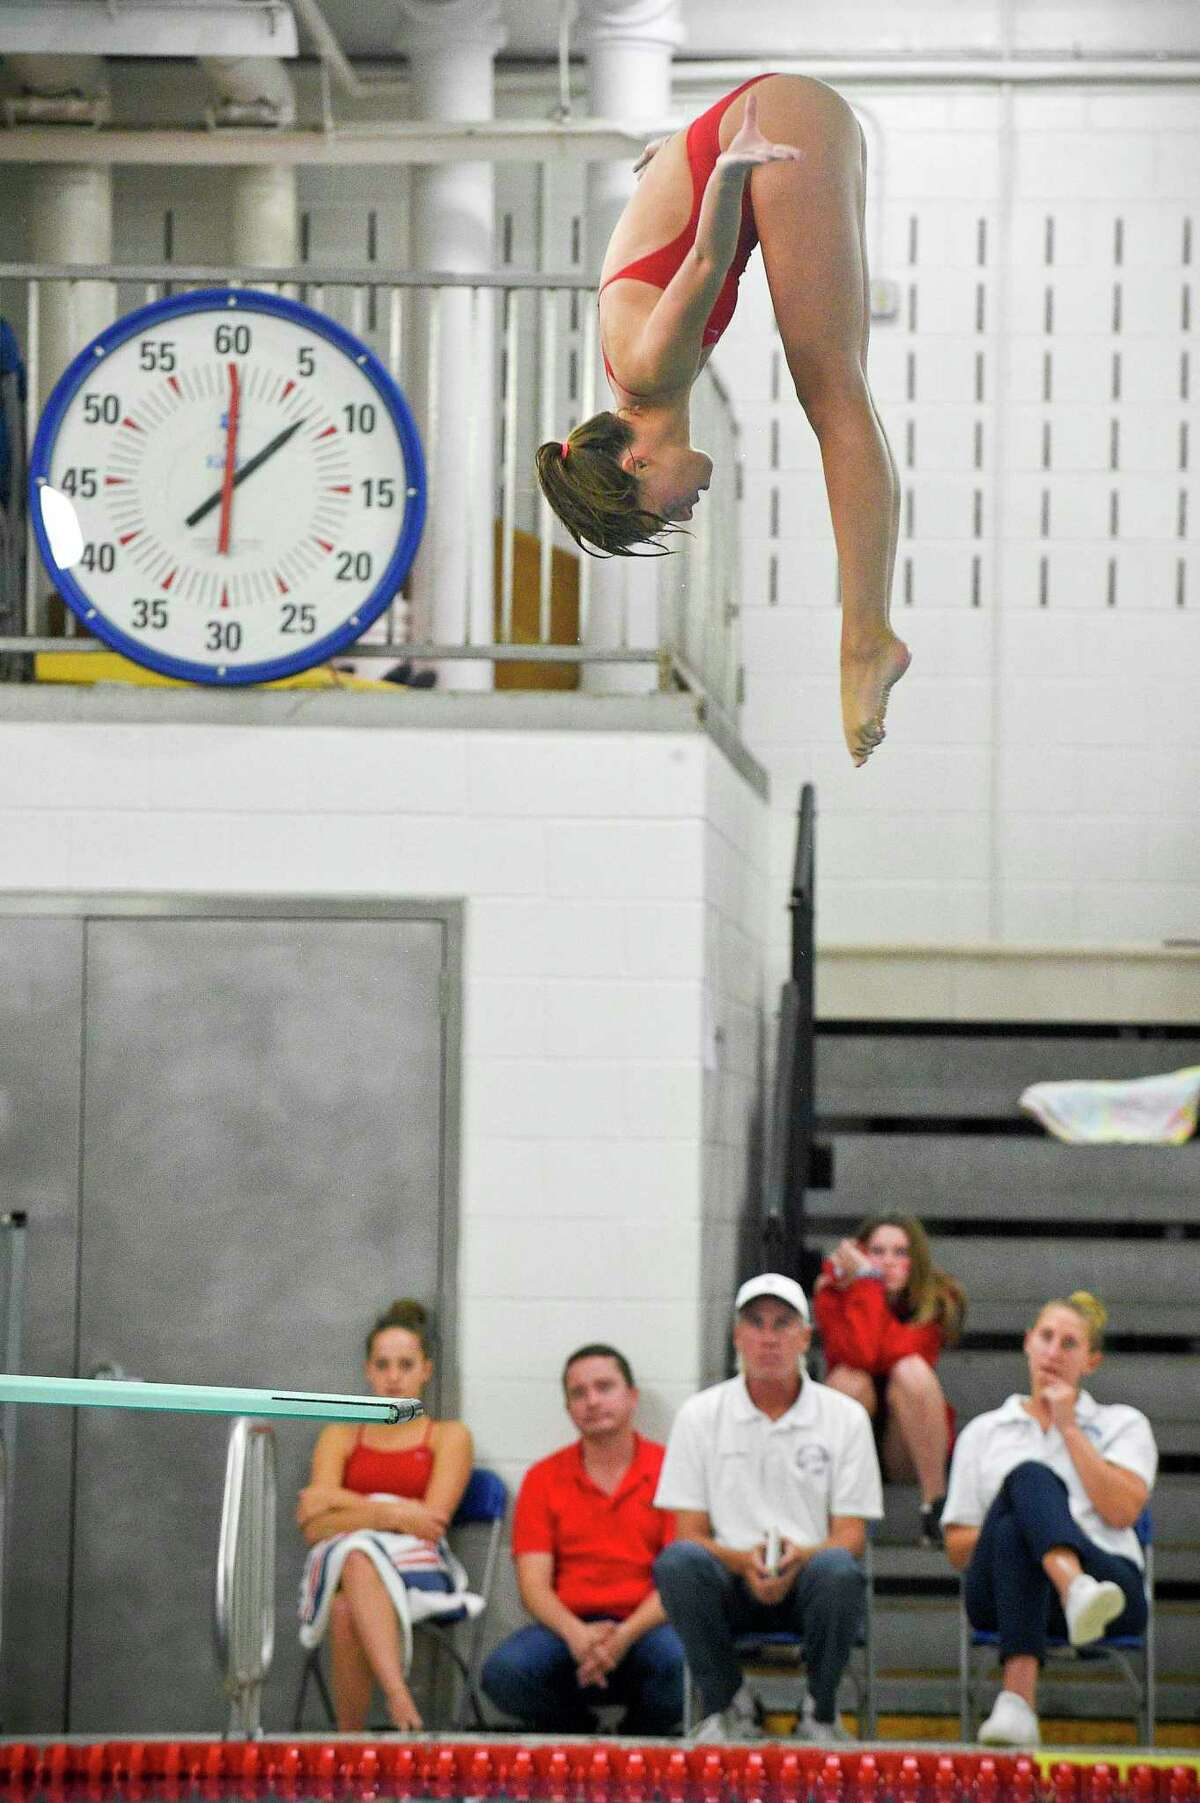 Greenwich's Saylor Kirsch won the CIAC Class LL diving finals at Middletown High School on Wednesday.